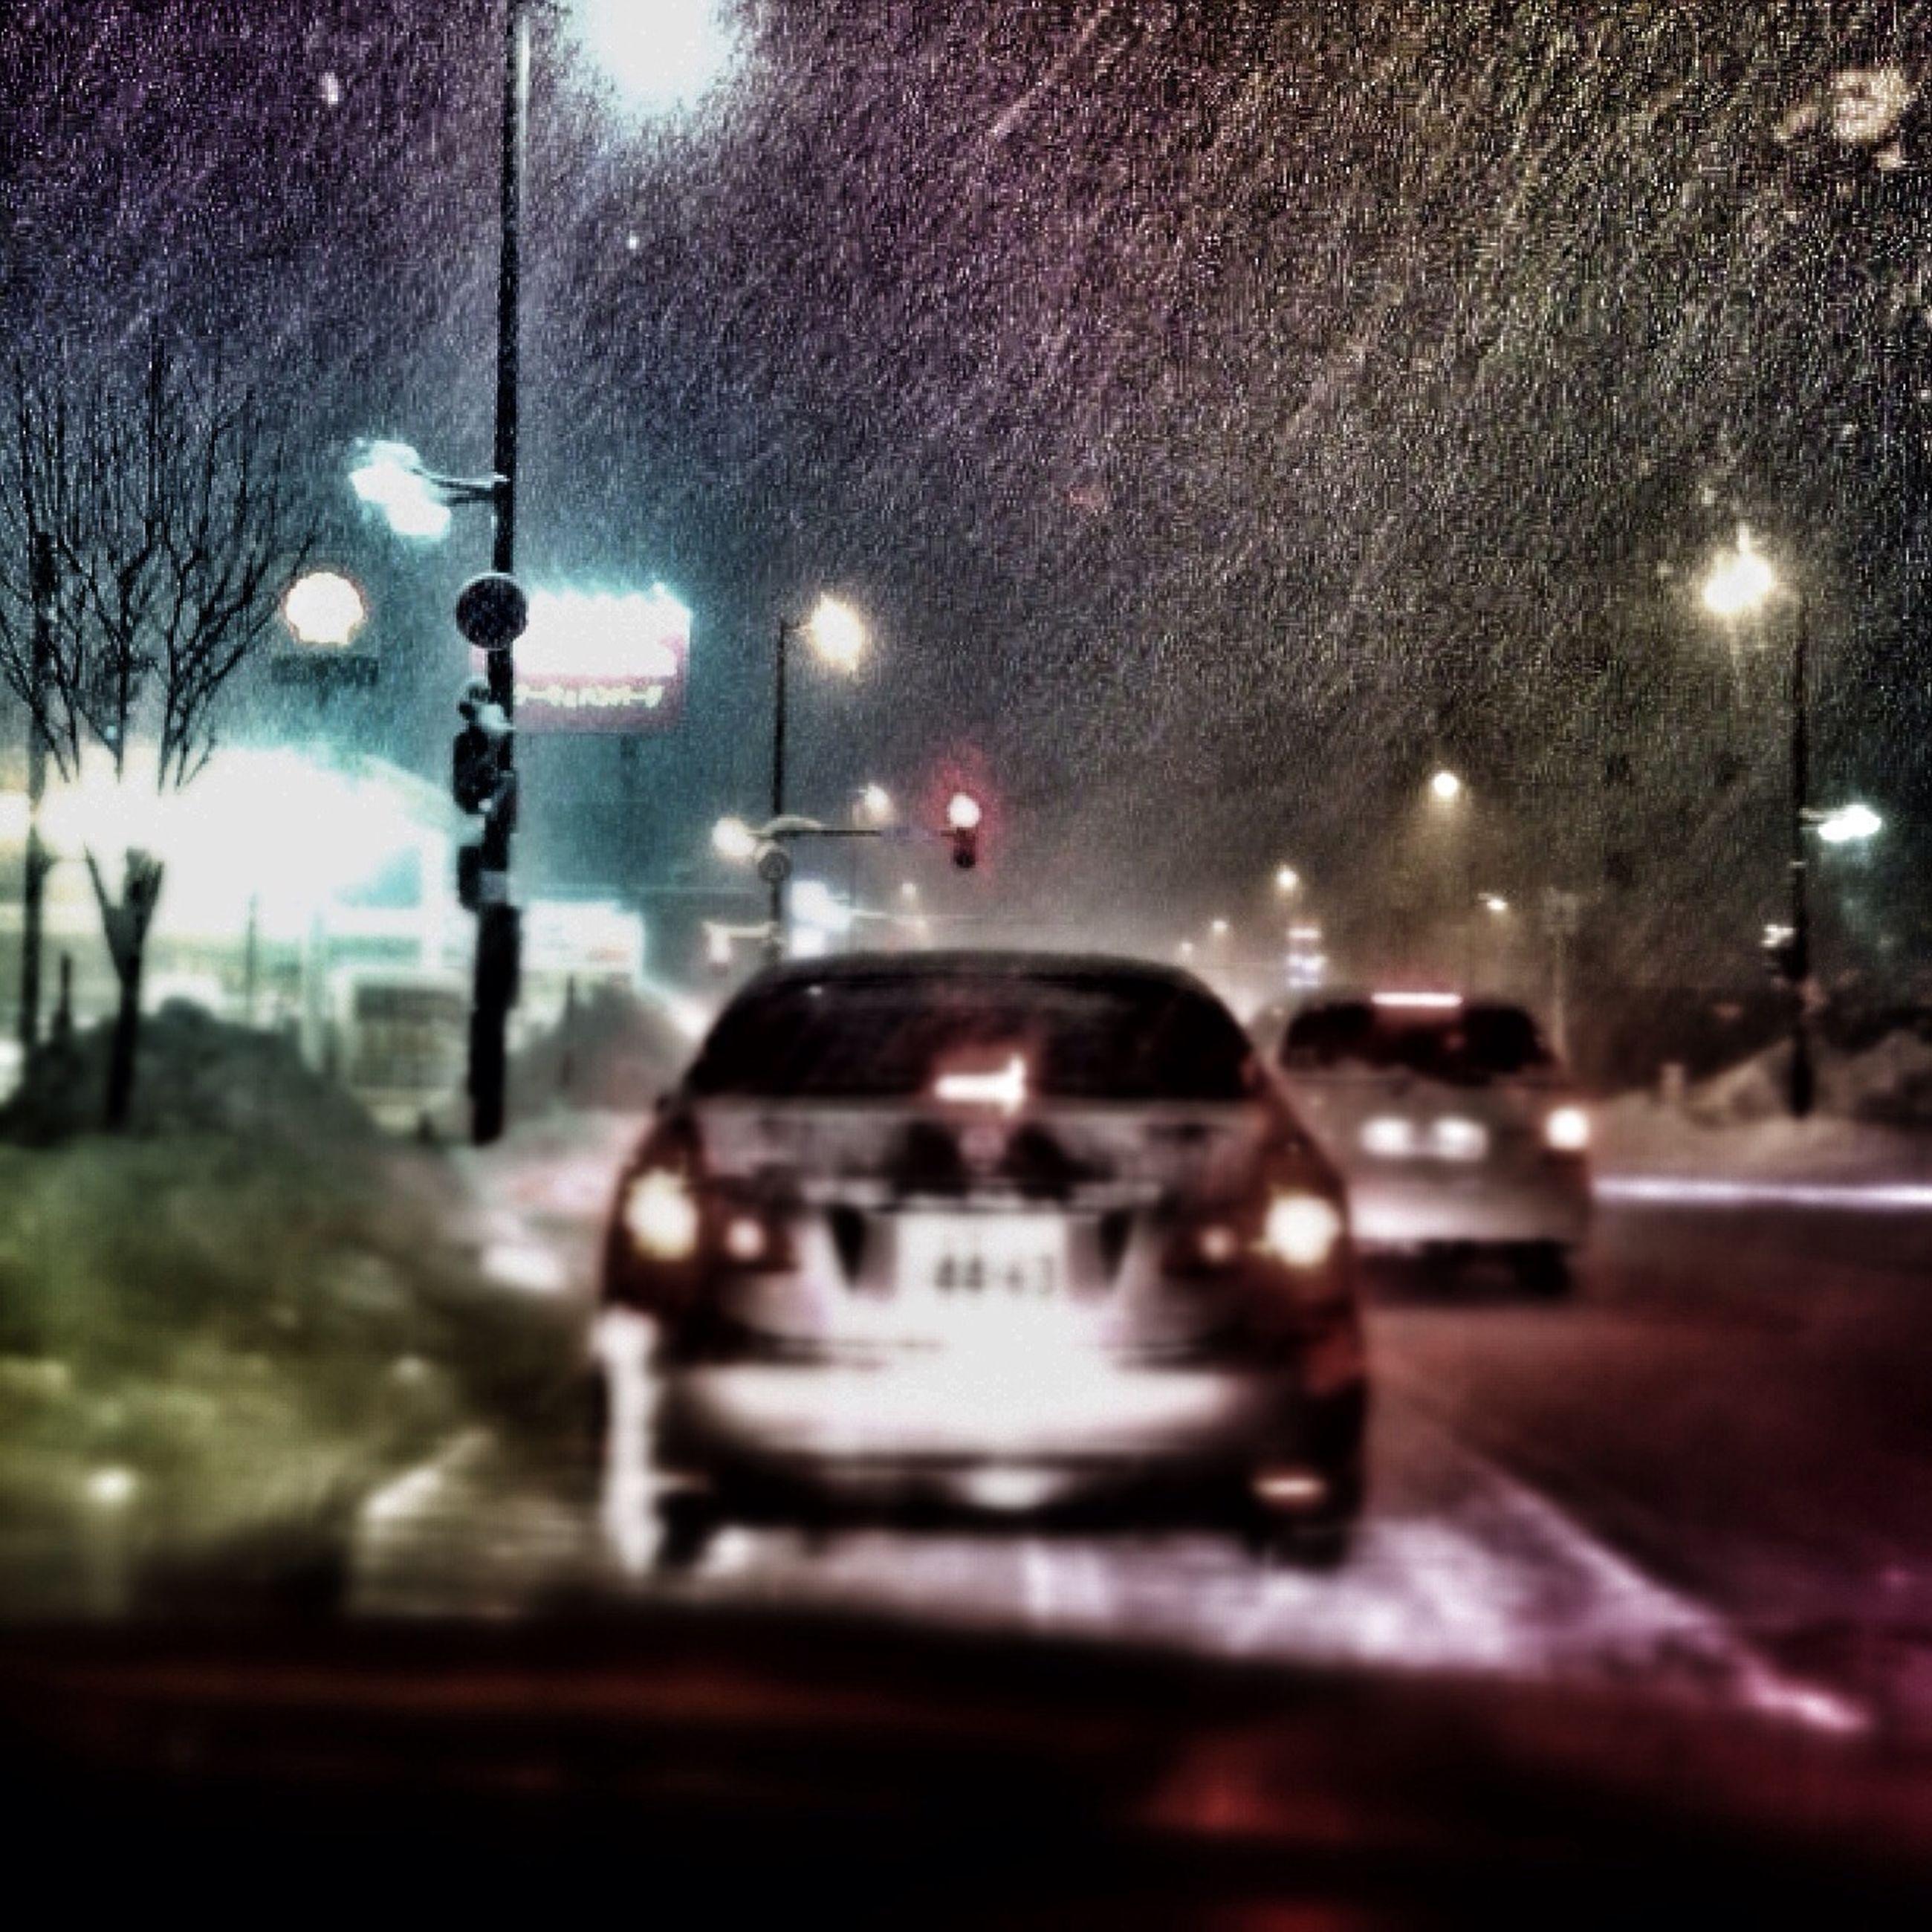 transportation, car, land vehicle, mode of transport, illuminated, night, windshield, street light, wet, transparent, street, glass - material, rain, headlight, road, vehicle interior, on the move, season, travel, traffic